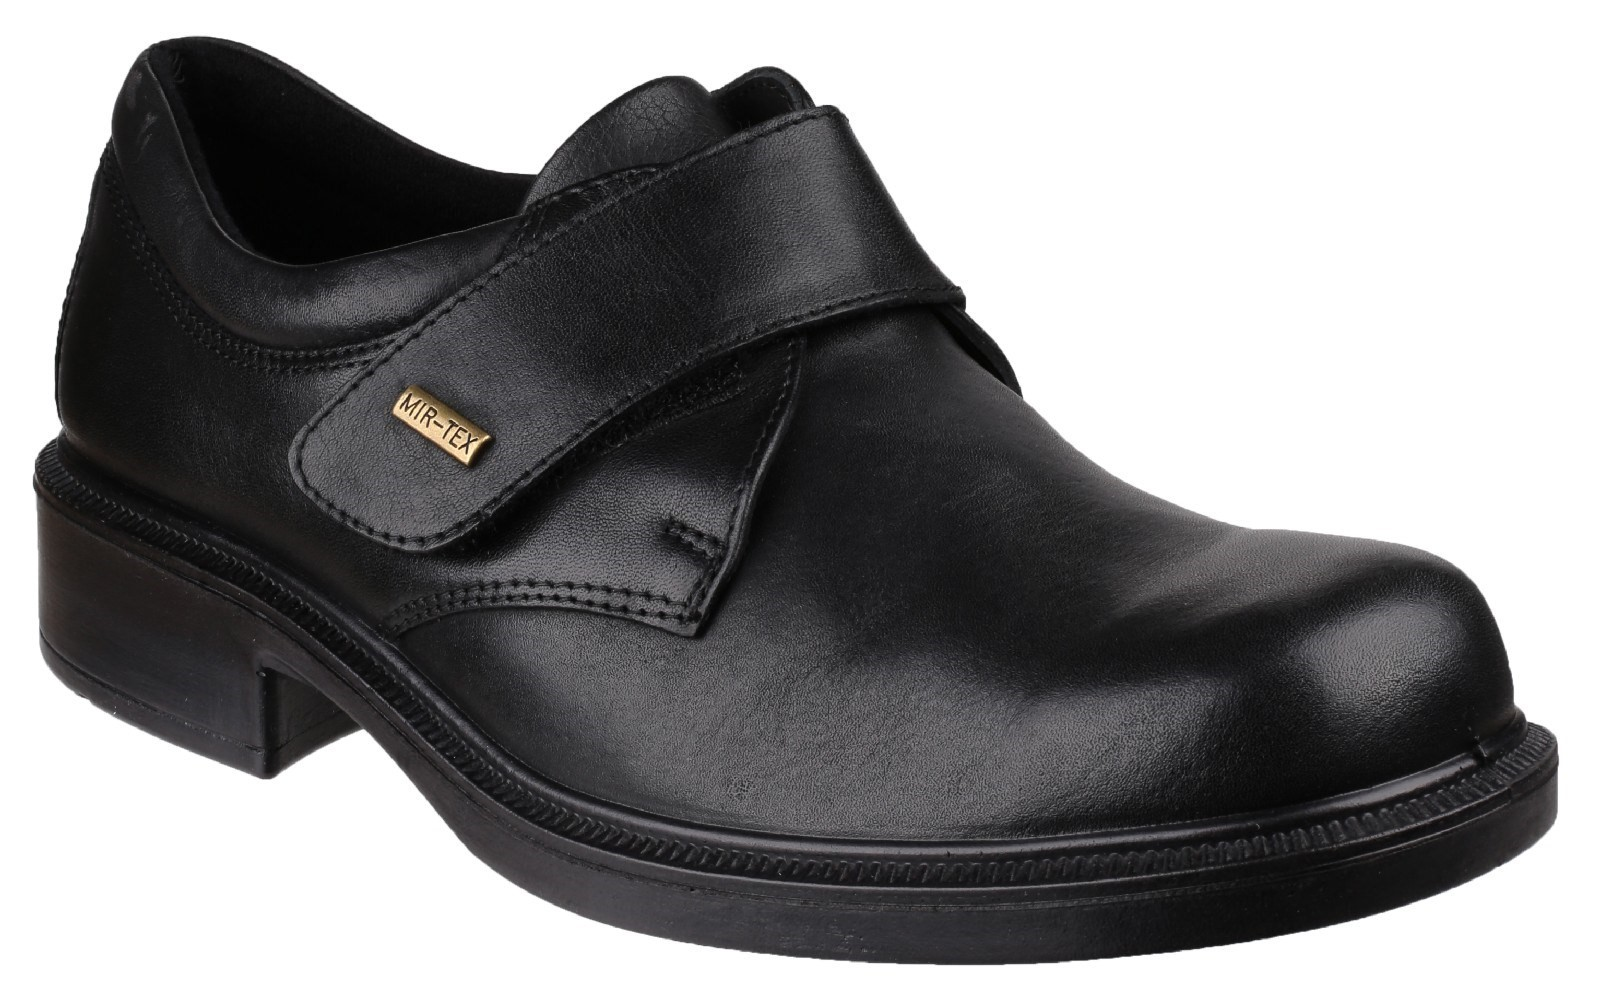 Cotswold Cleeve schwarz or Braun shoe Leder waterproof touch fastening shoe Braun a7dc3a